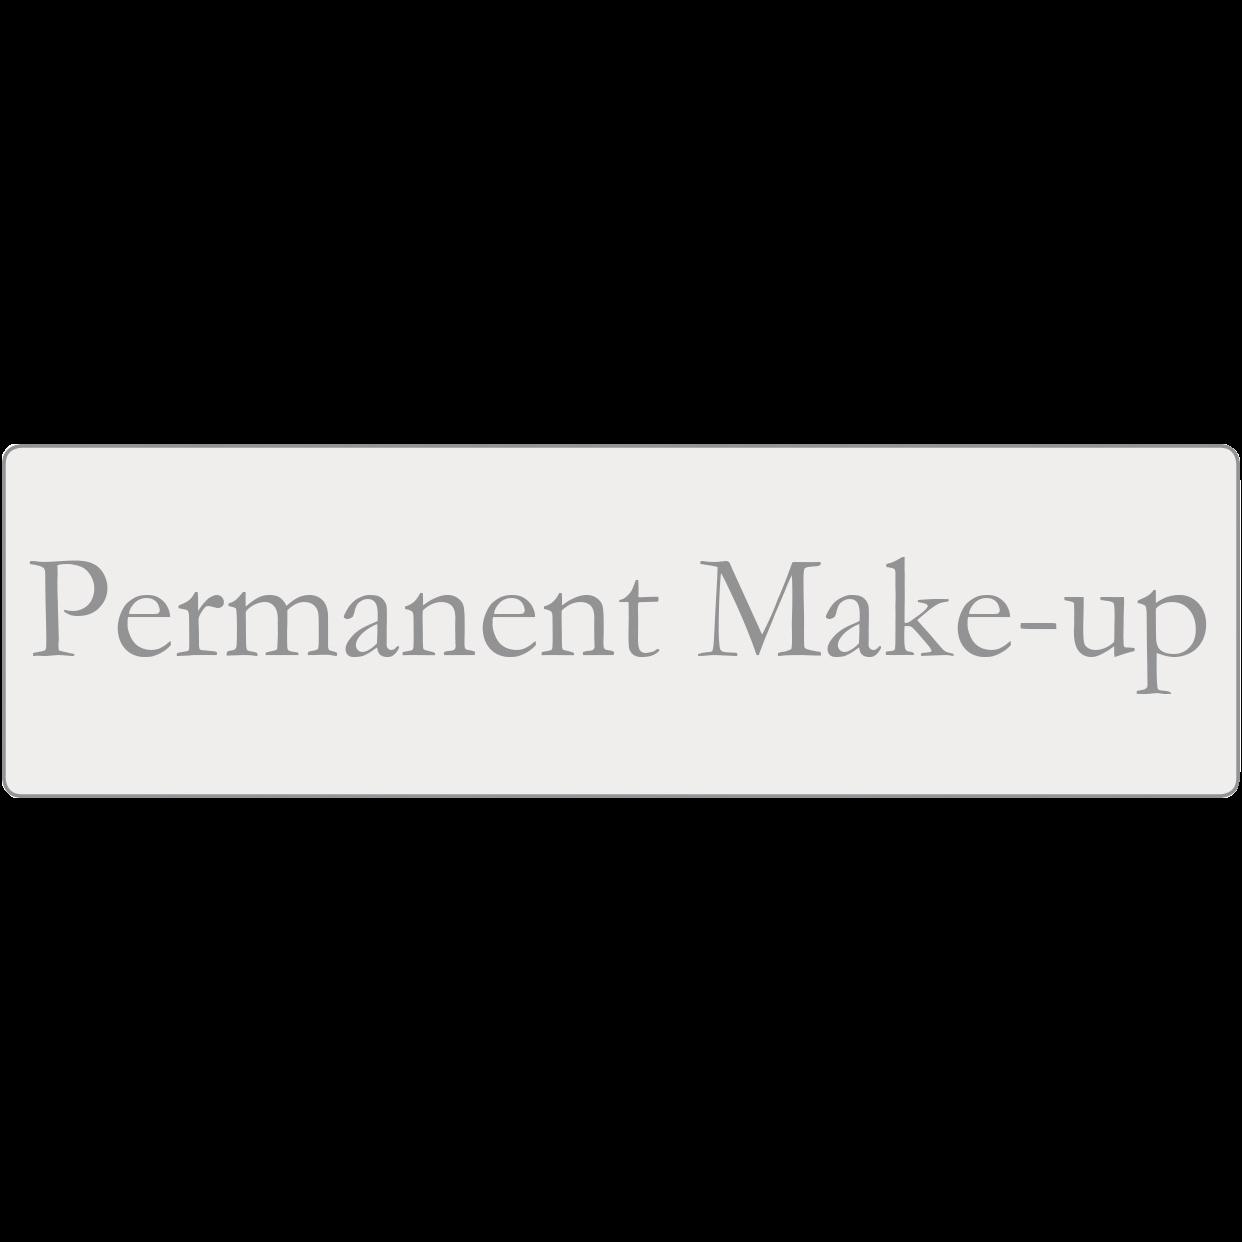 Hinweisschild Permanent Makeup 35 x 10 cm rechteckig